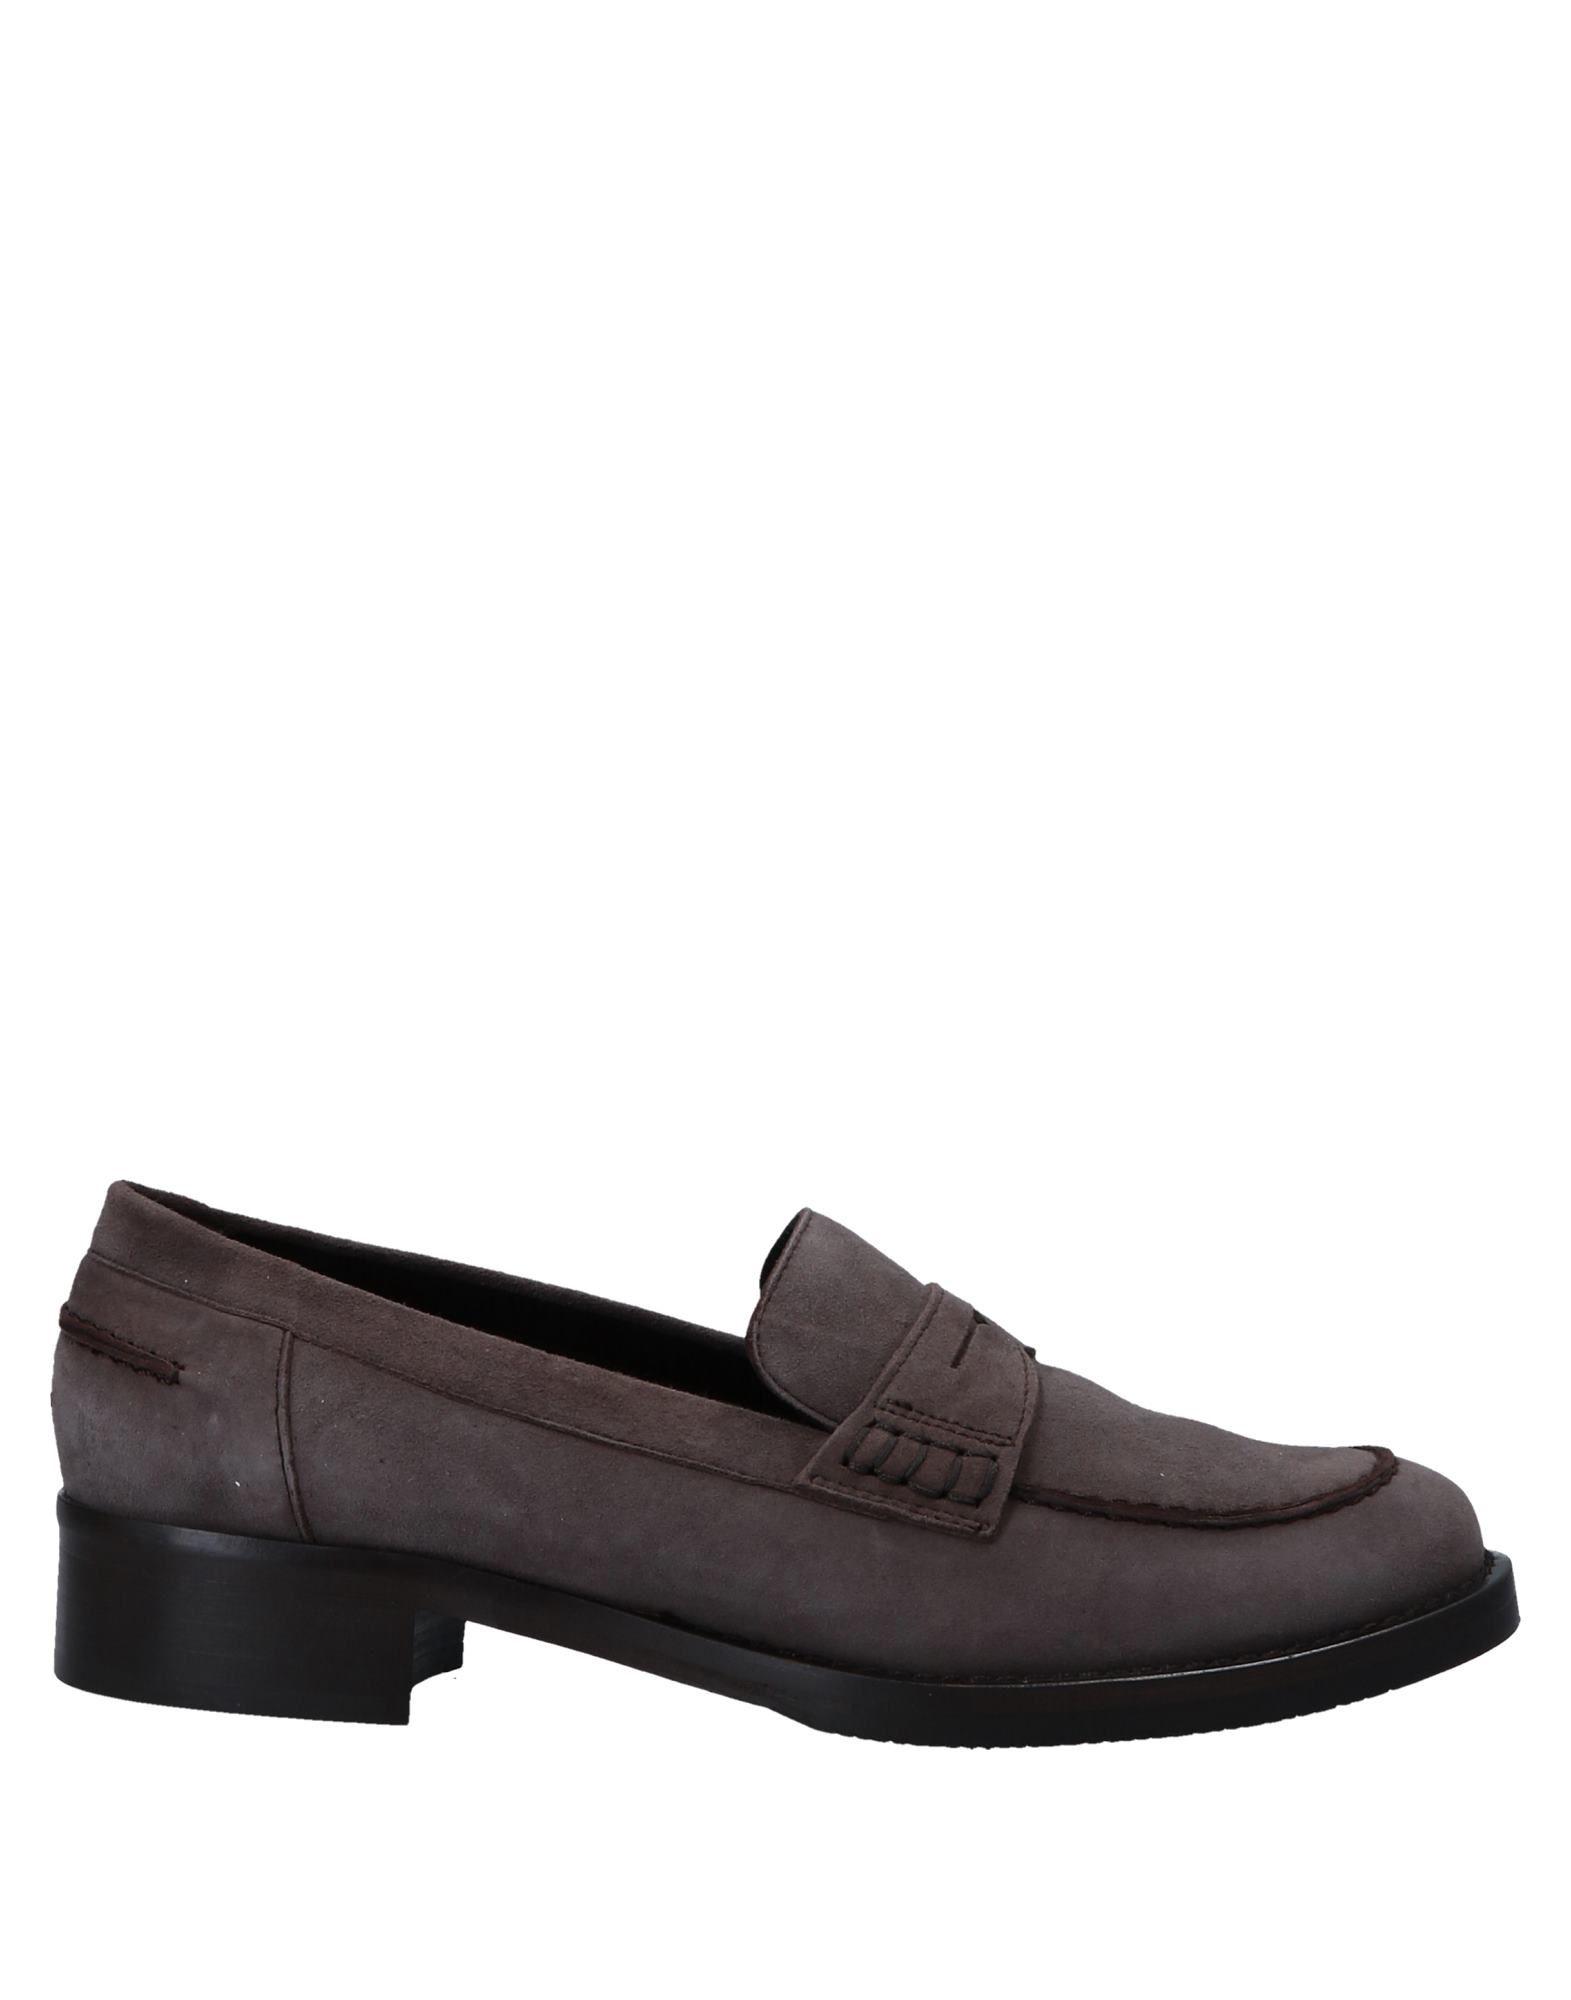 Sneakers Nuove Geox Donna - 11551534MS Nuove Sneakers offerte e scarpe comode bbd927